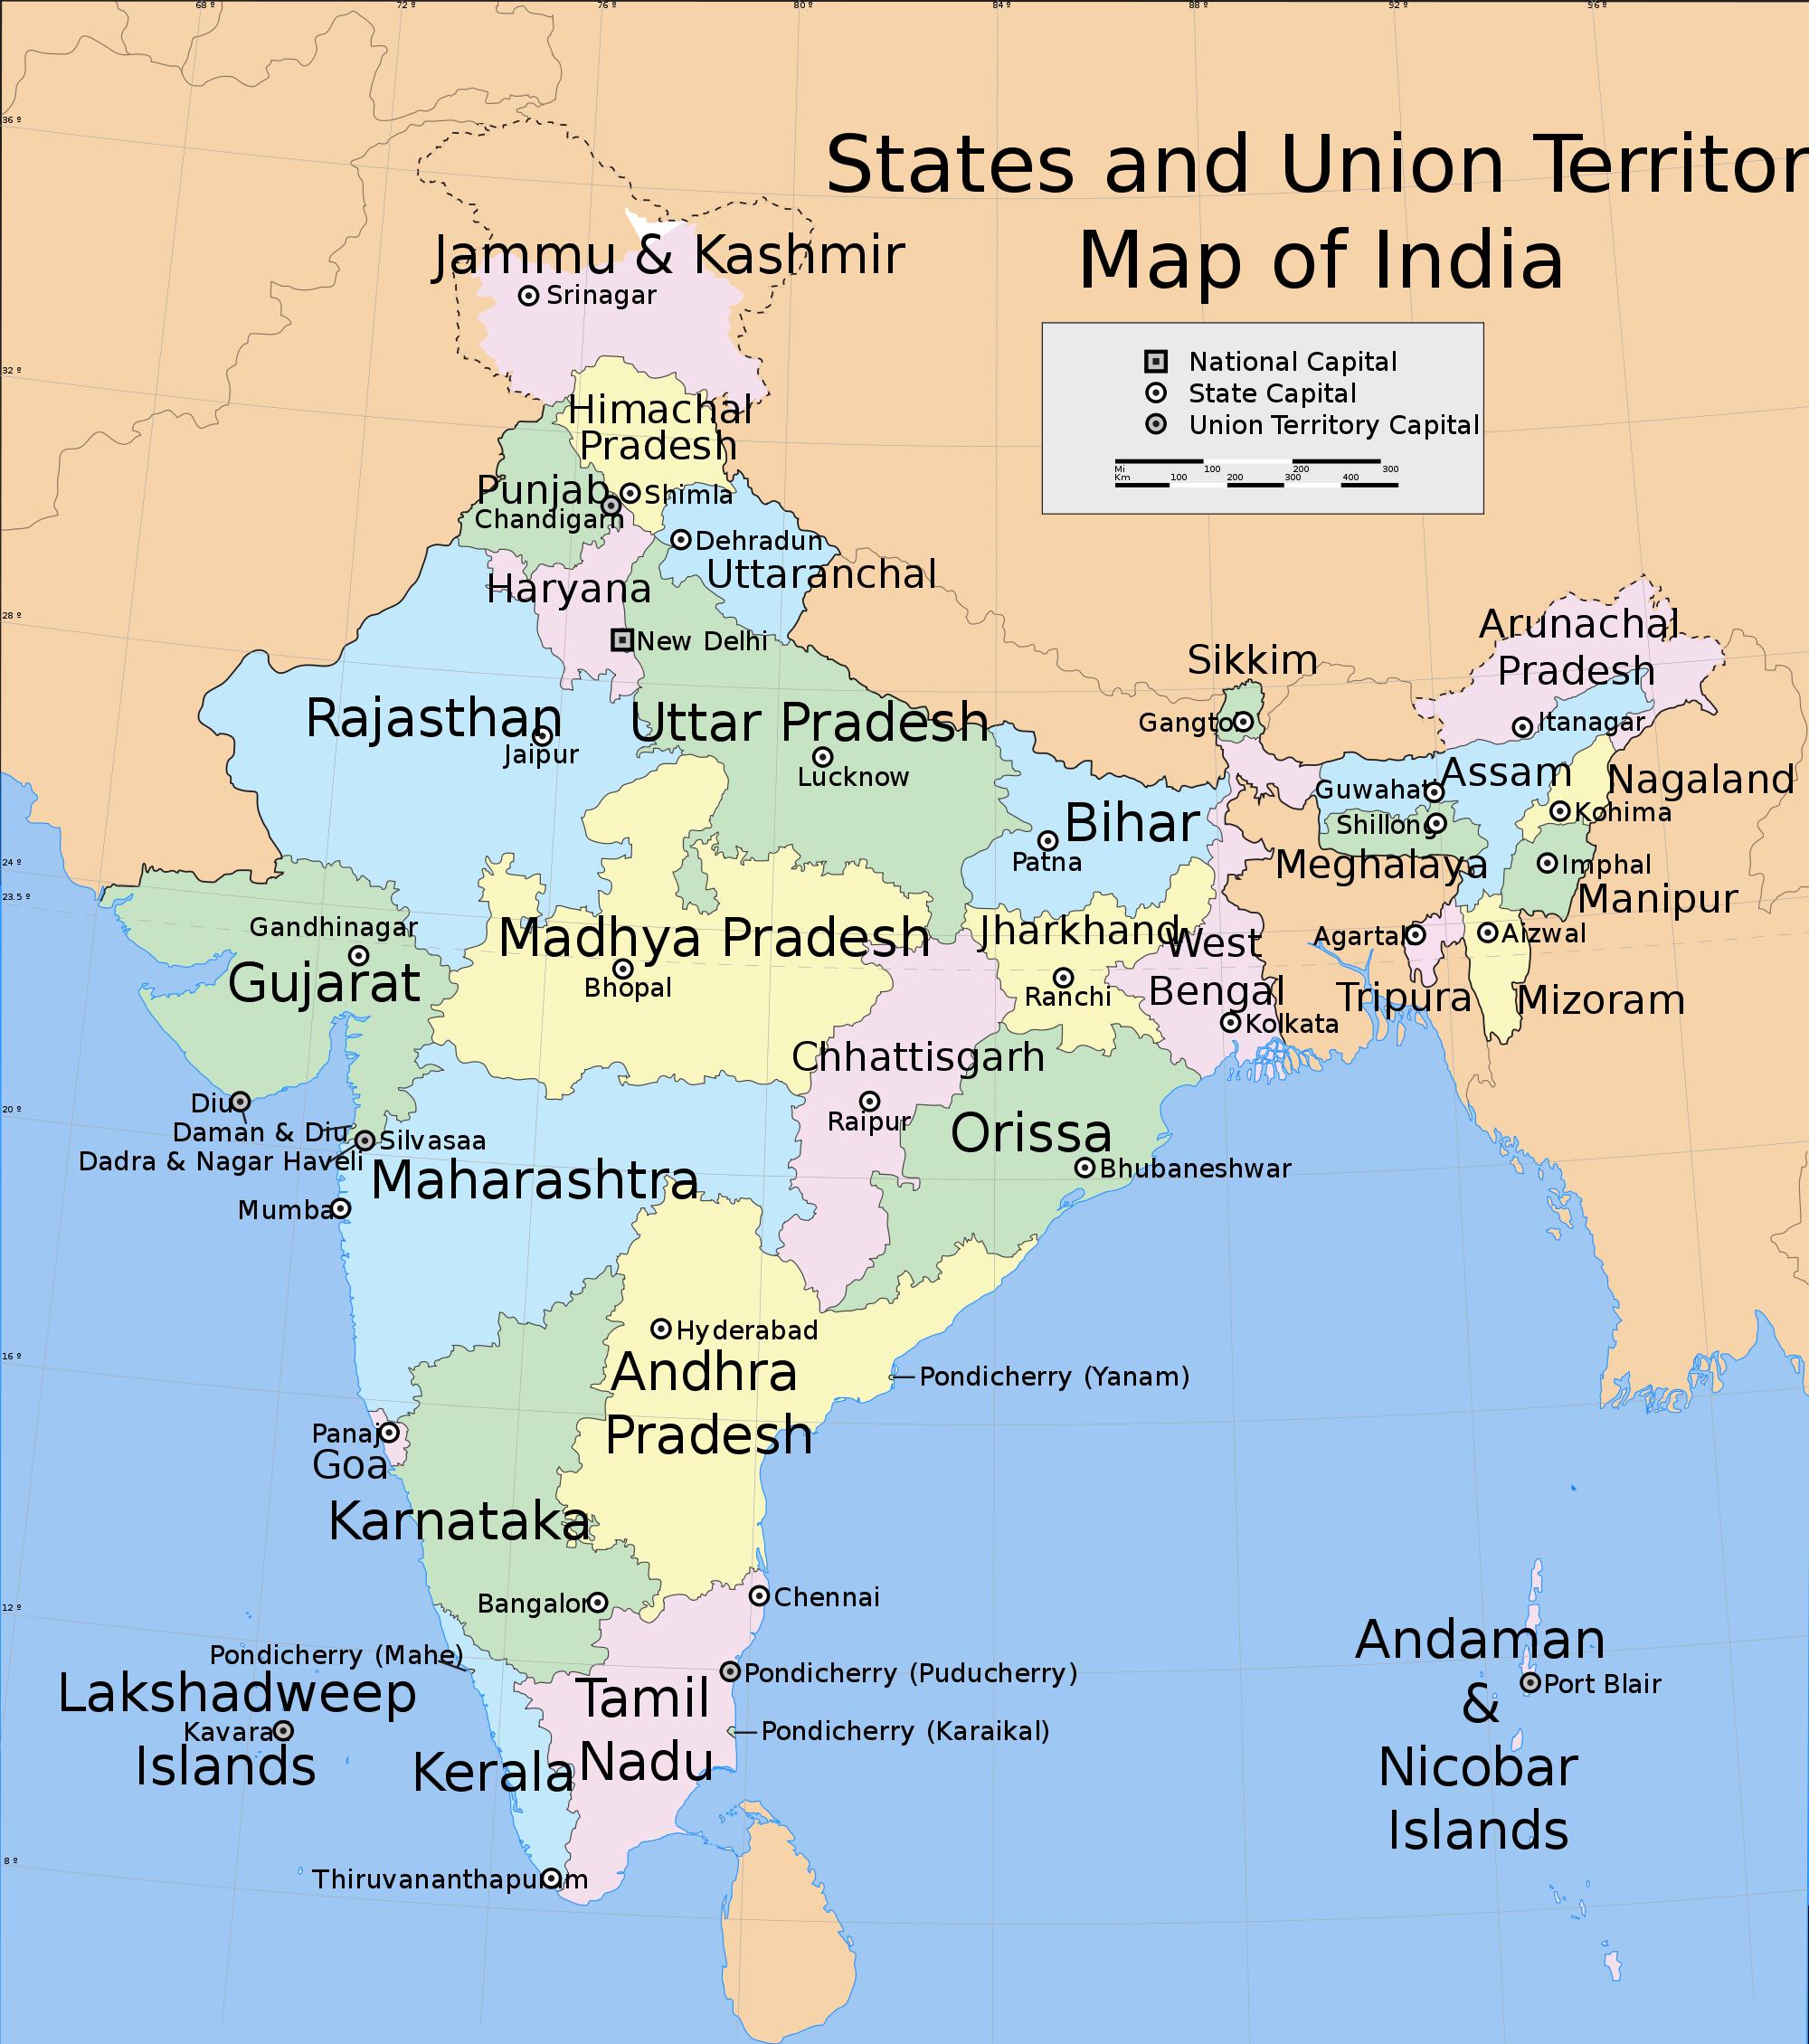 India states and union territories map  India  Pinterest  Union